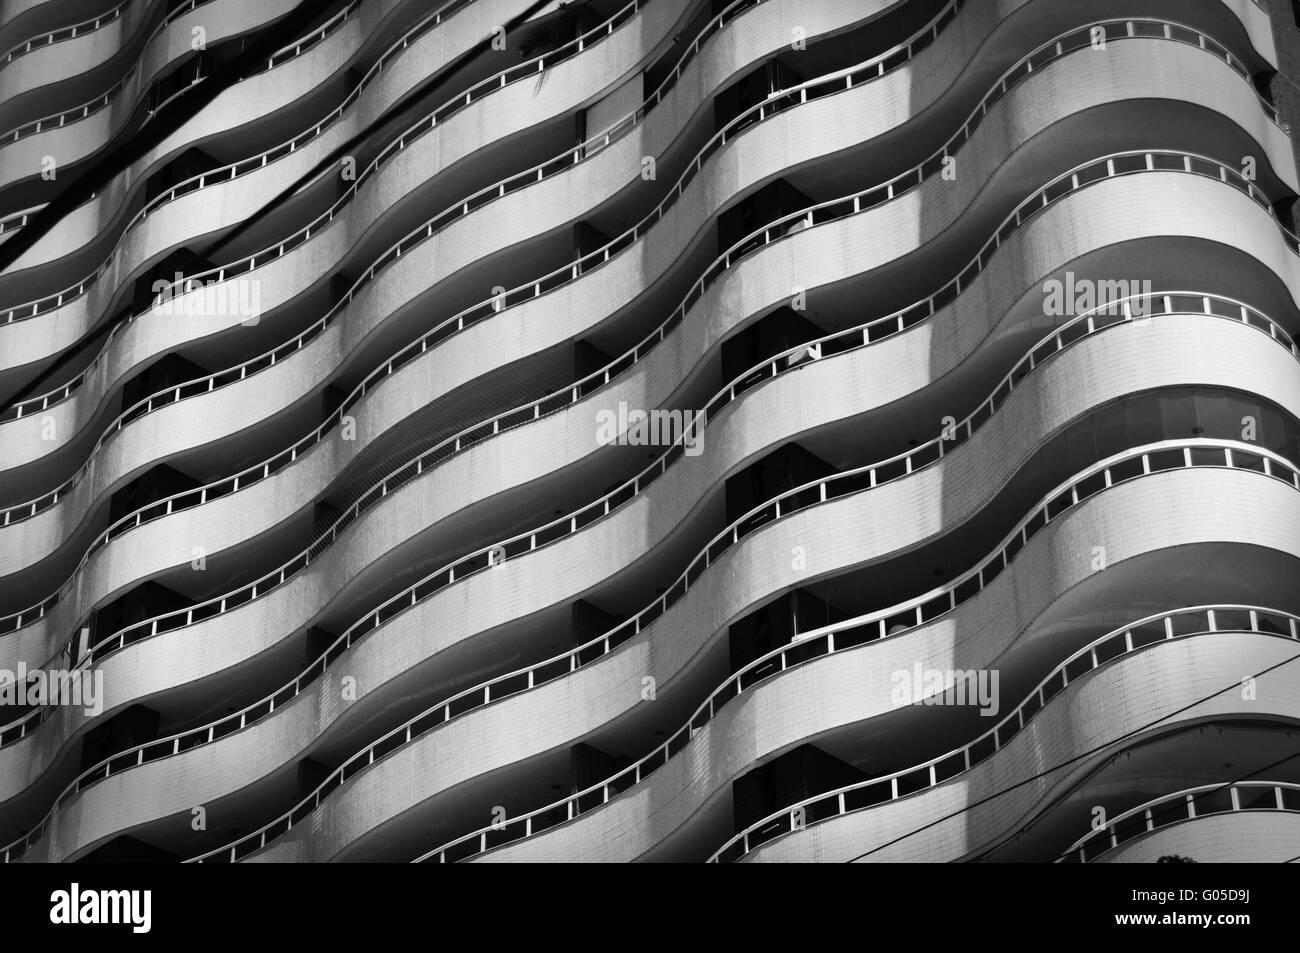 BRA, Brasilien, Bahia, Salvador, 10.12.2009, Hochhaus in der Avenida Sete de Setembro im Stadtteil Barra.  [(c) - Stock Image